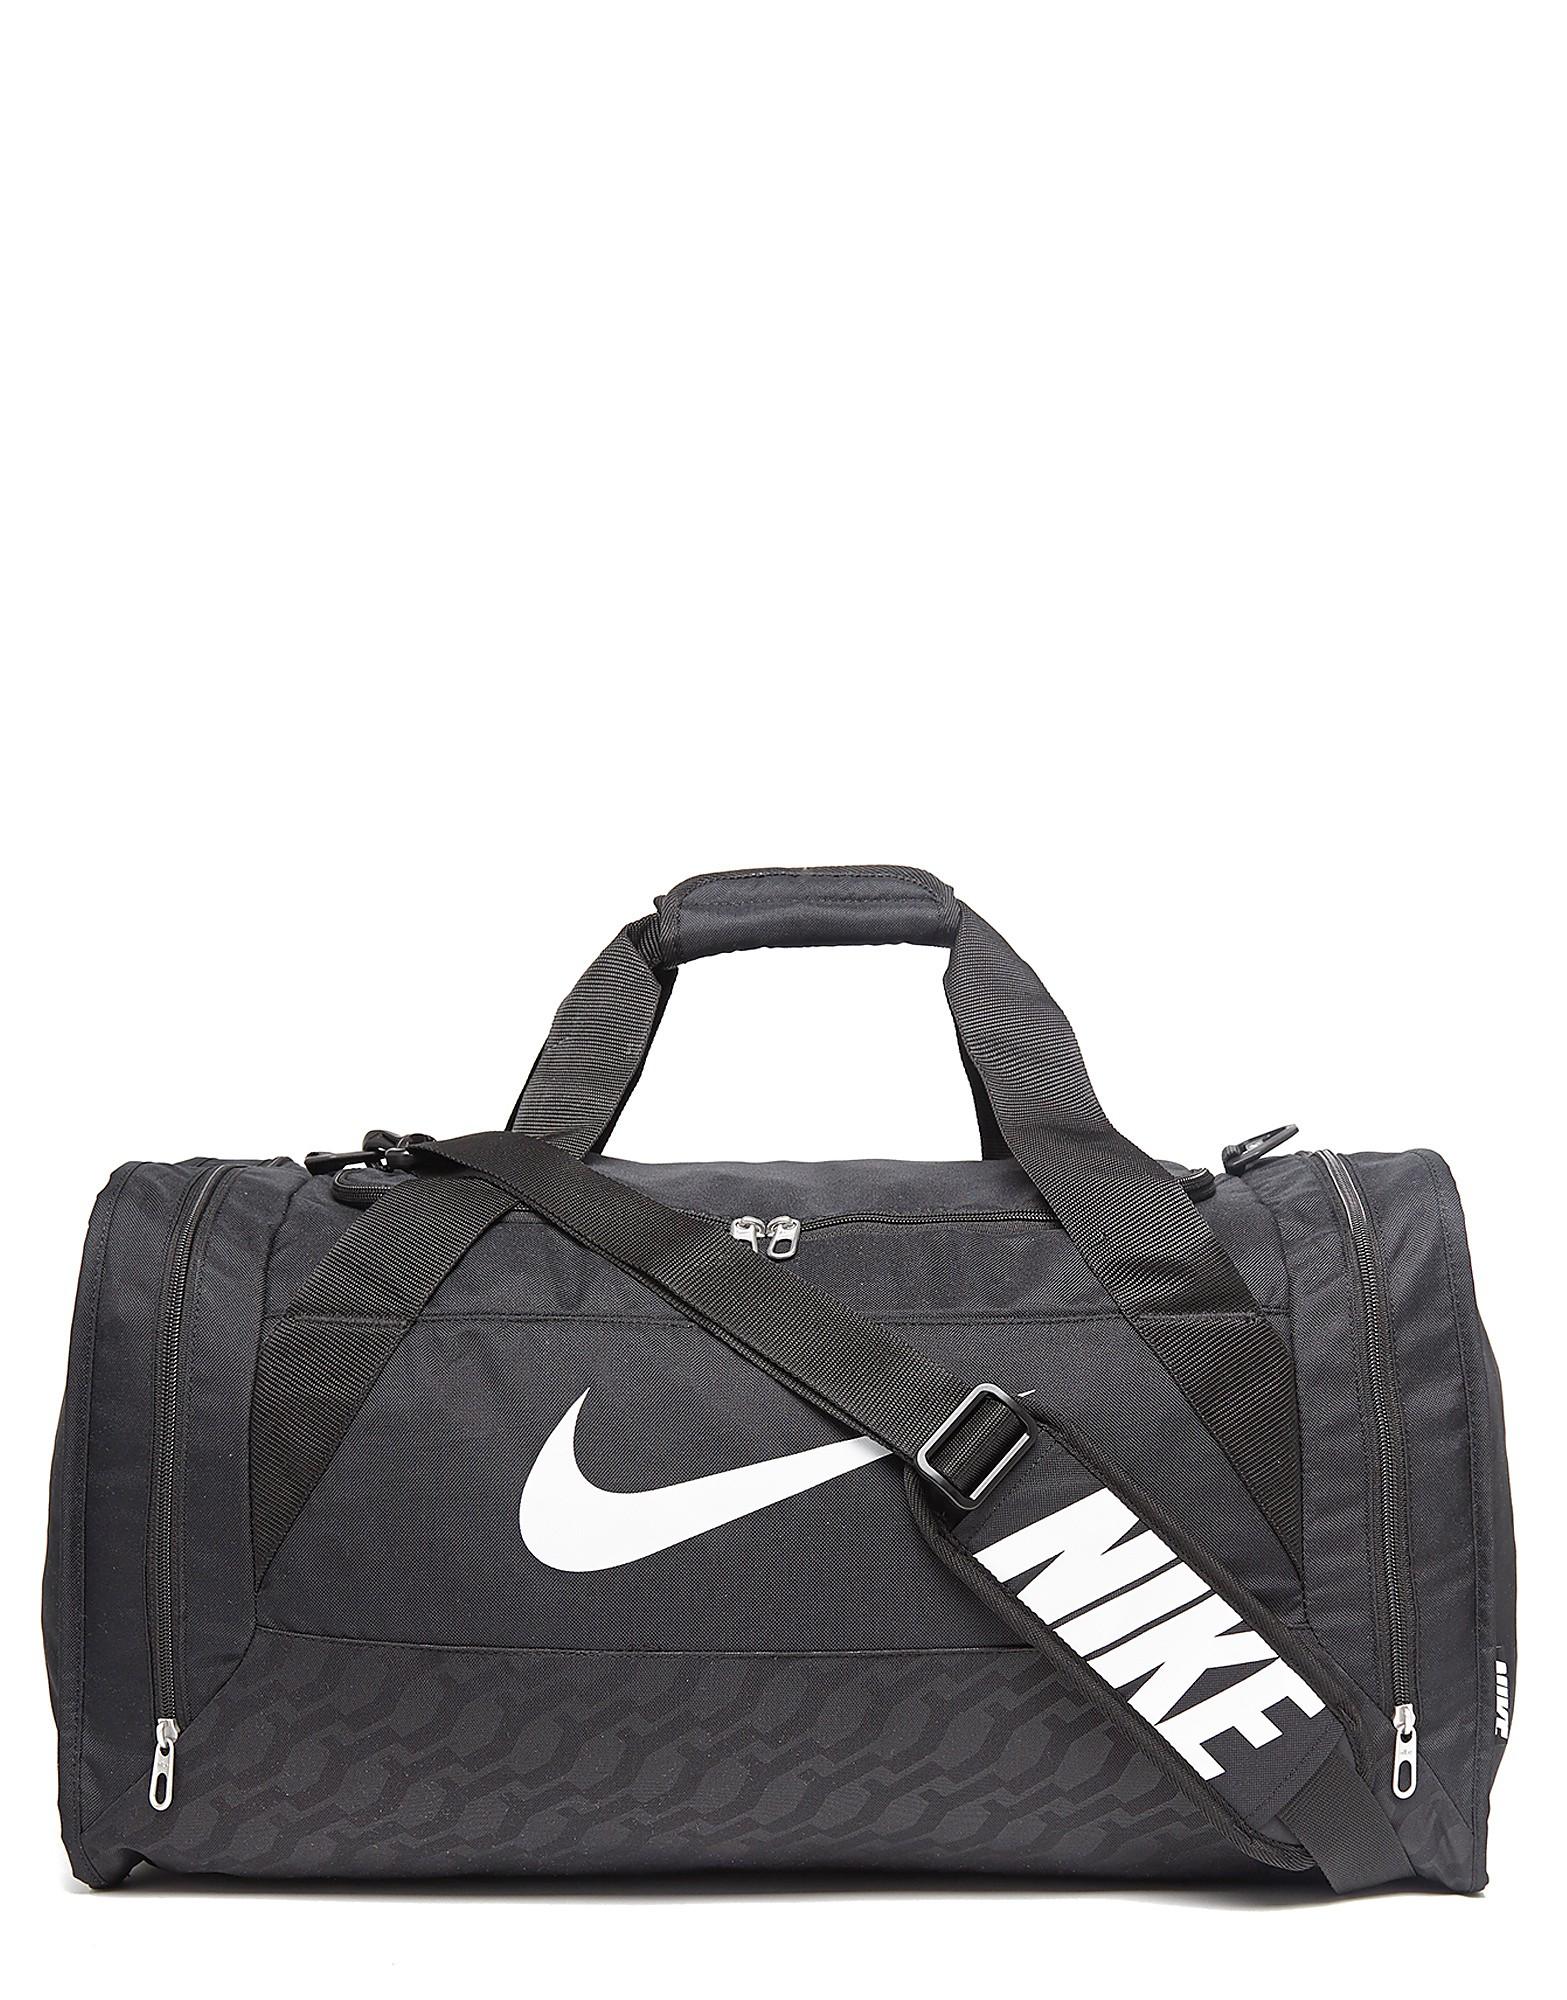 Nike Brasilia 6 Duffel Bag mittelgroß